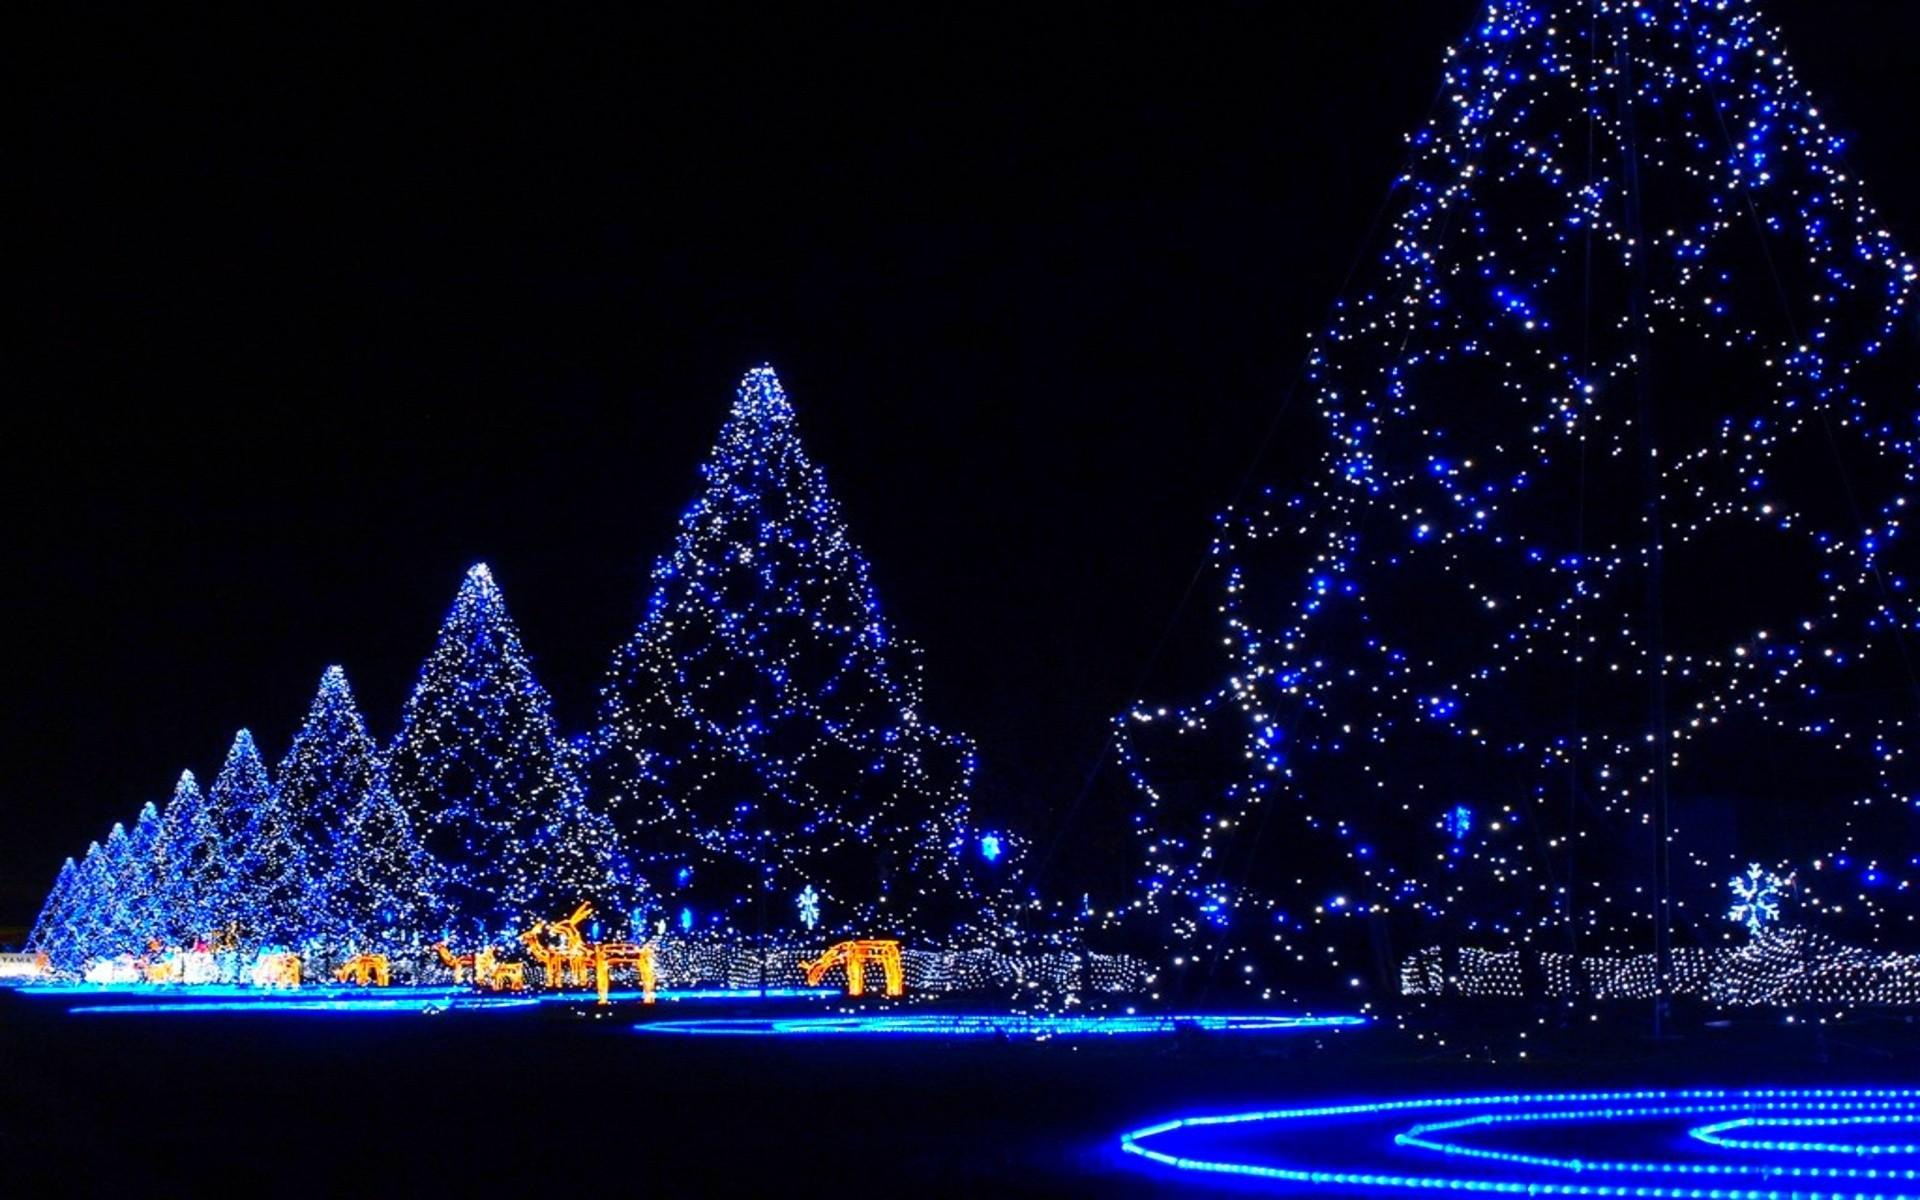 … 20 free download hd christmas desktop wallpapers merry christmas …